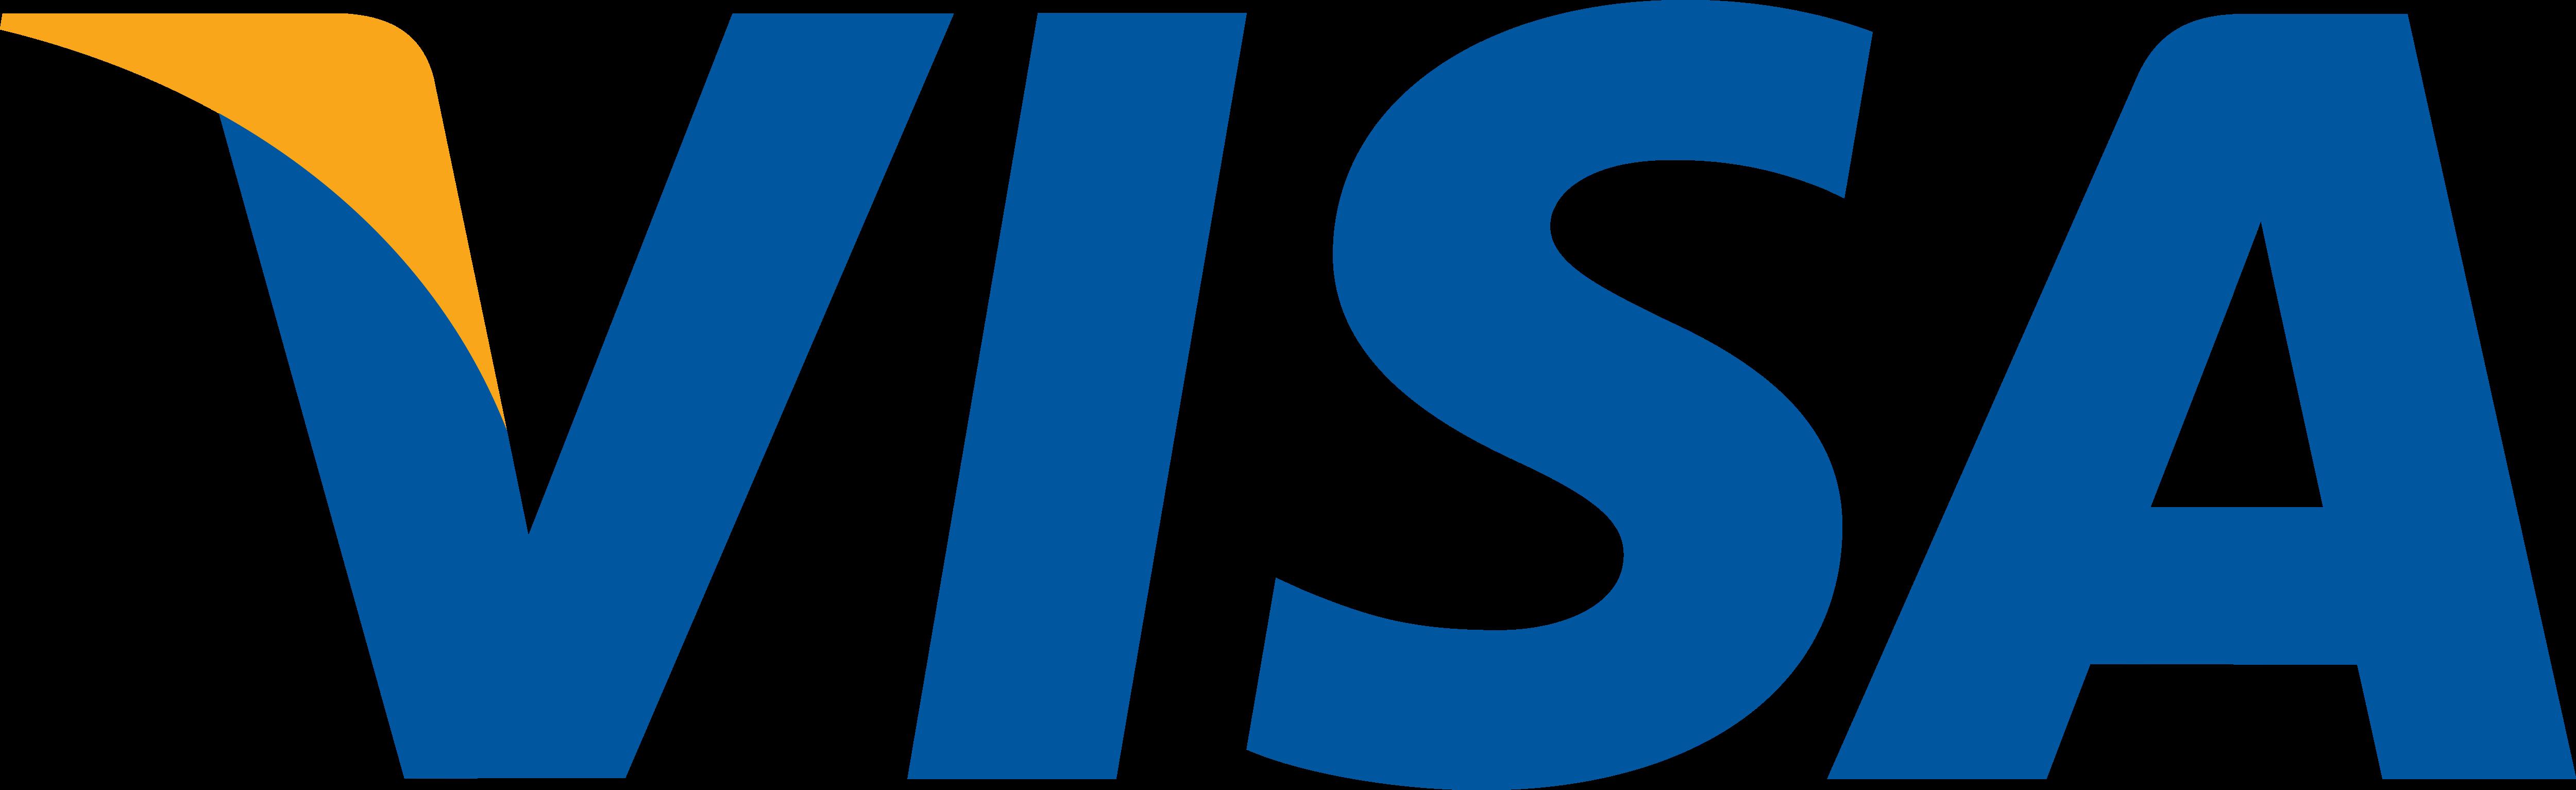 Visa Logo Png.